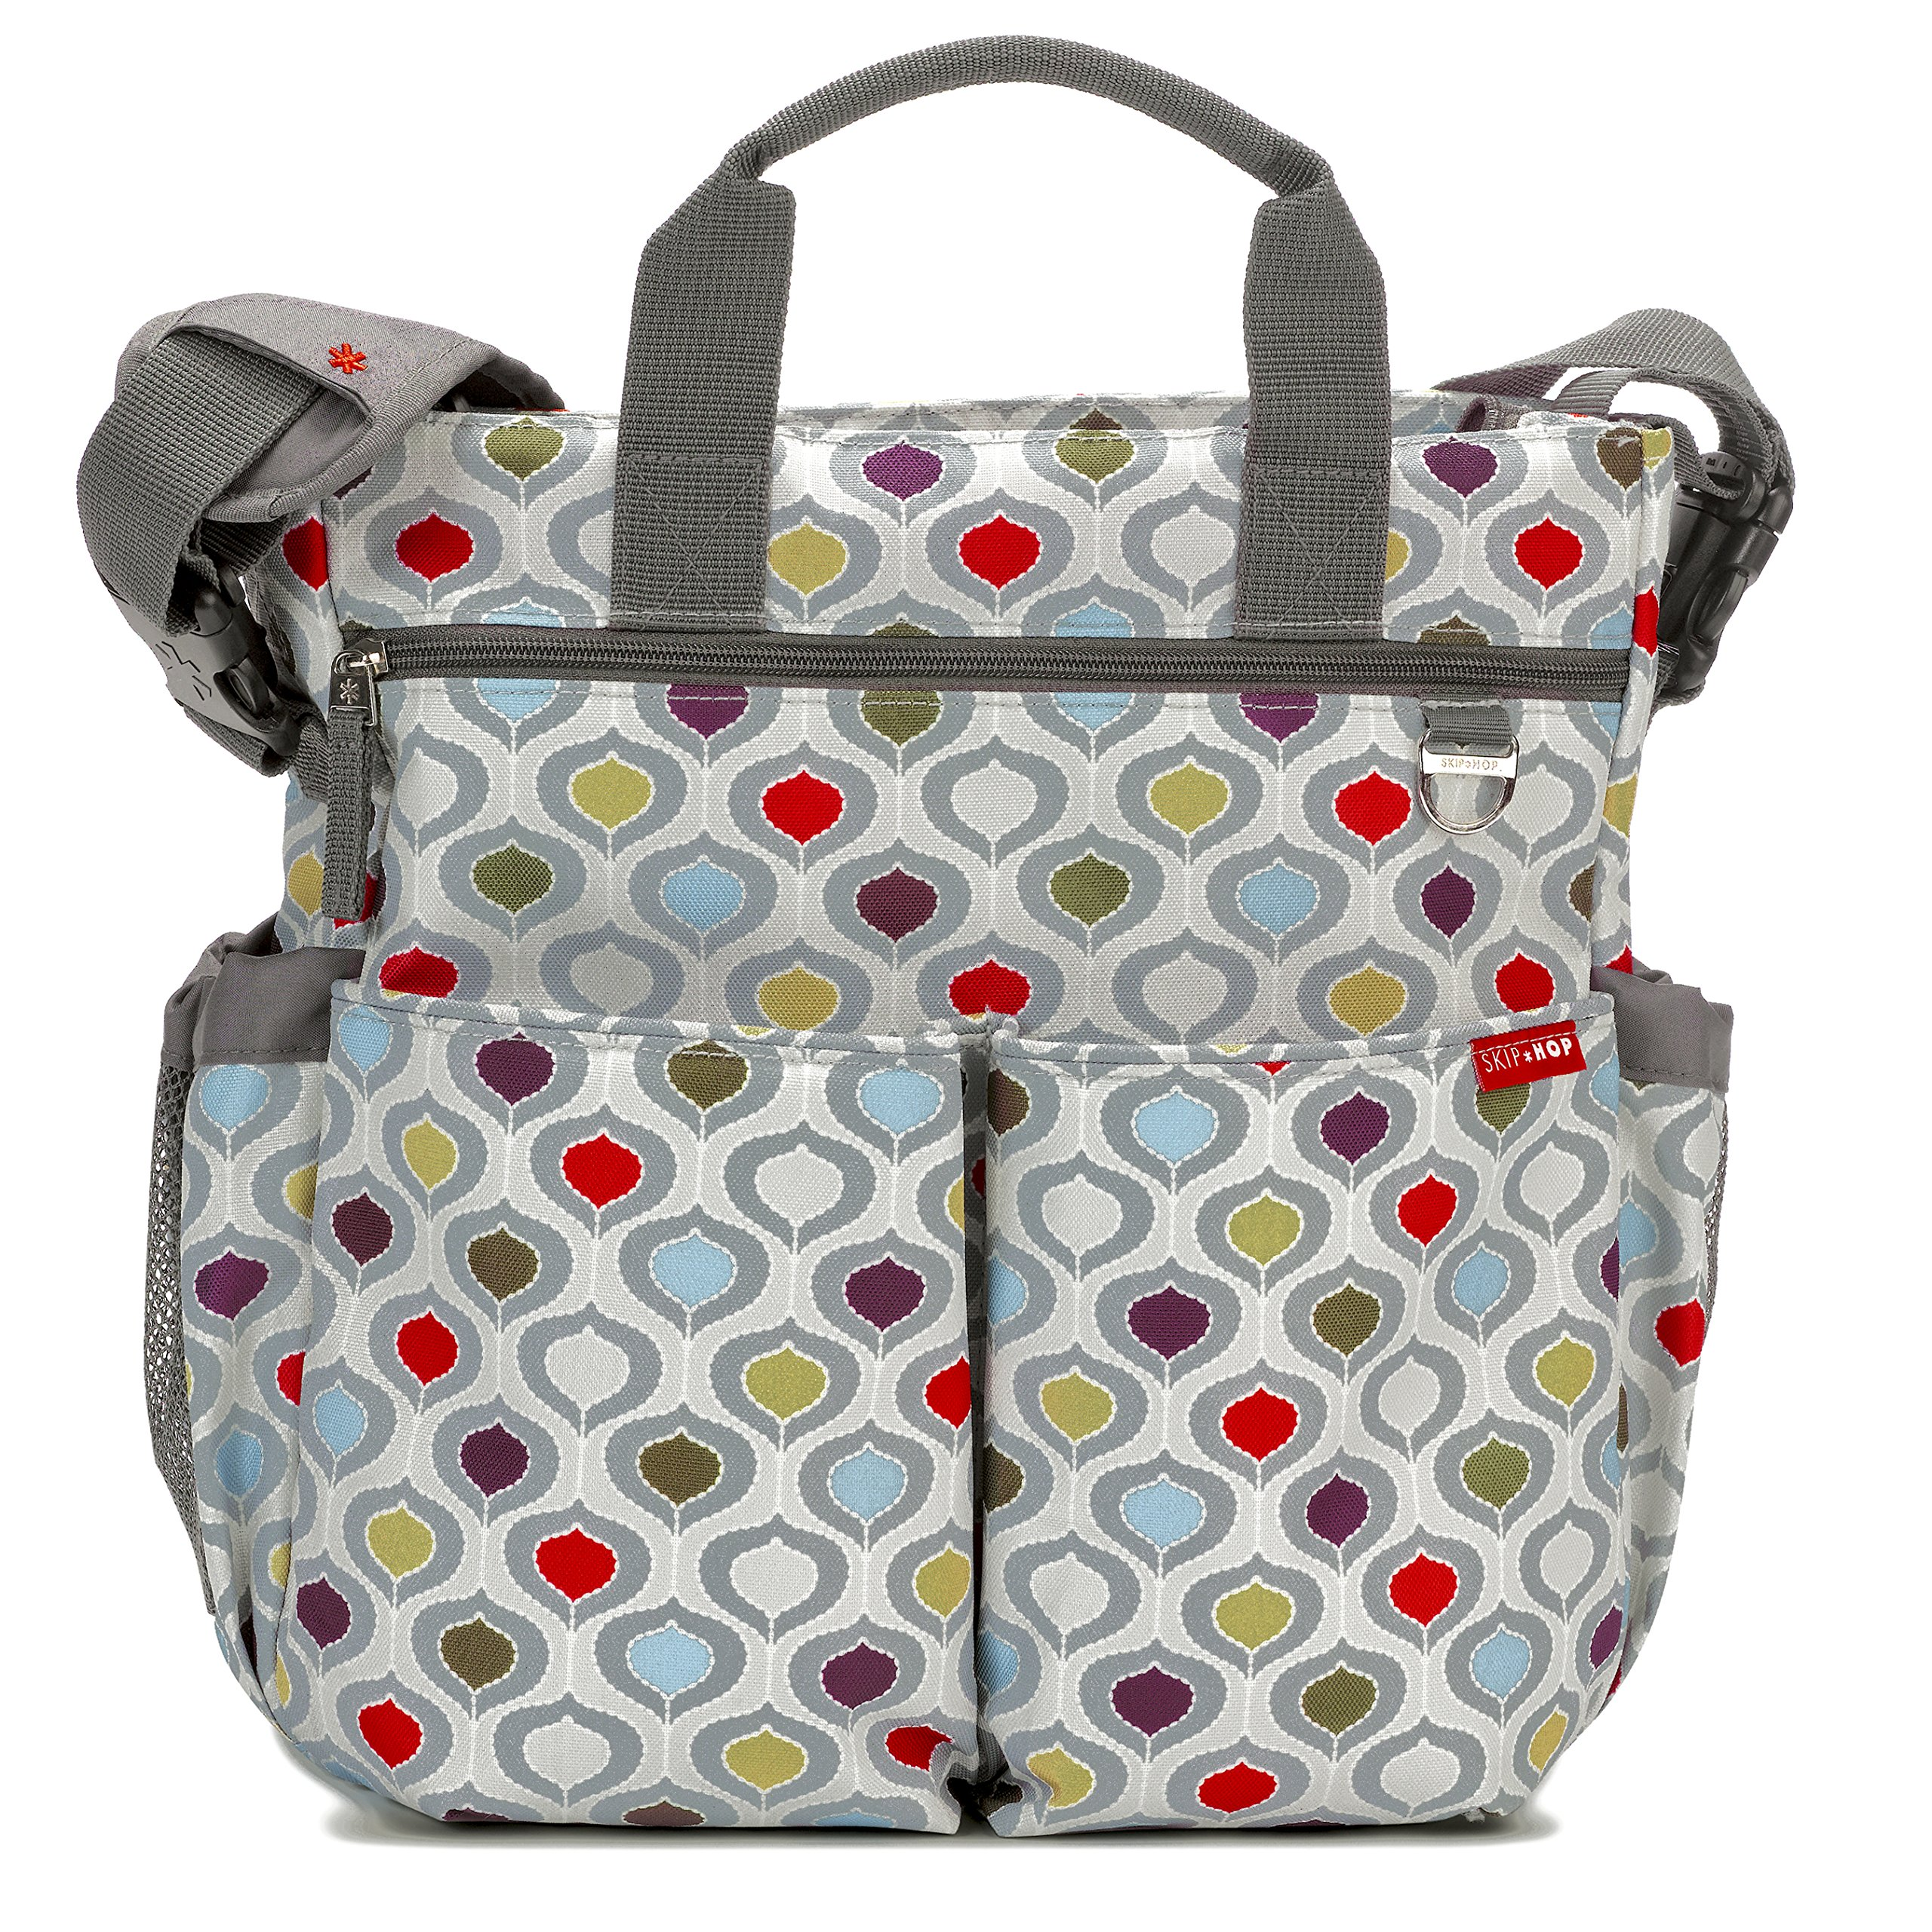 Skip Hop Baby Duo Signature Diaper Bag, Multipod